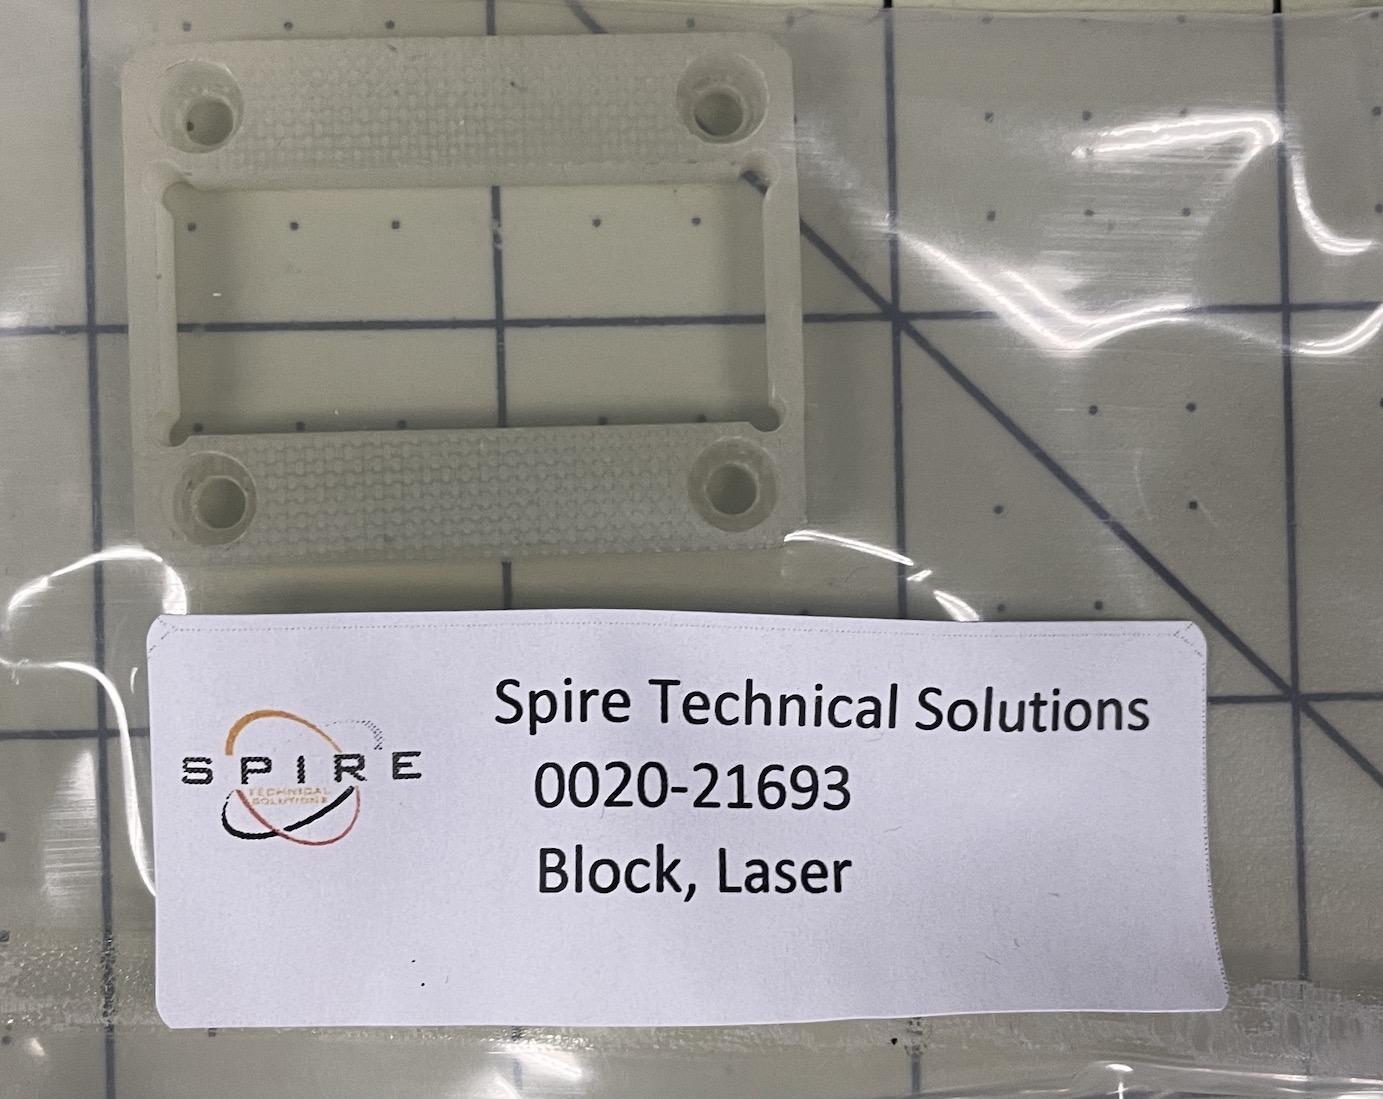 Block, Laser